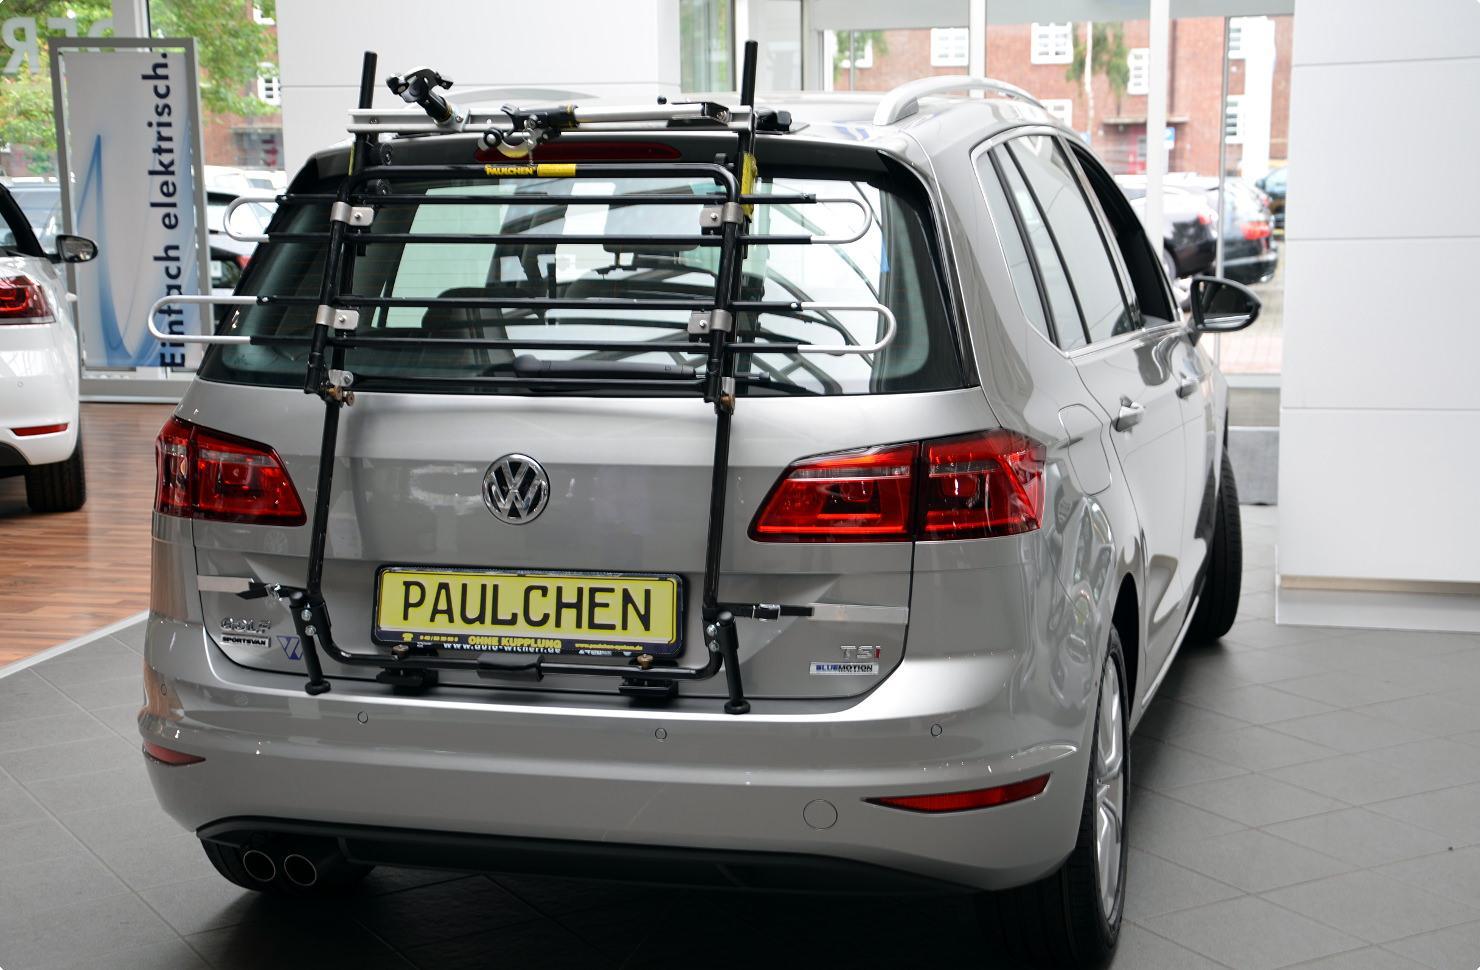 bicycle carrier for vw golf sportsvan am1 paulchen. Black Bedroom Furniture Sets. Home Design Ideas